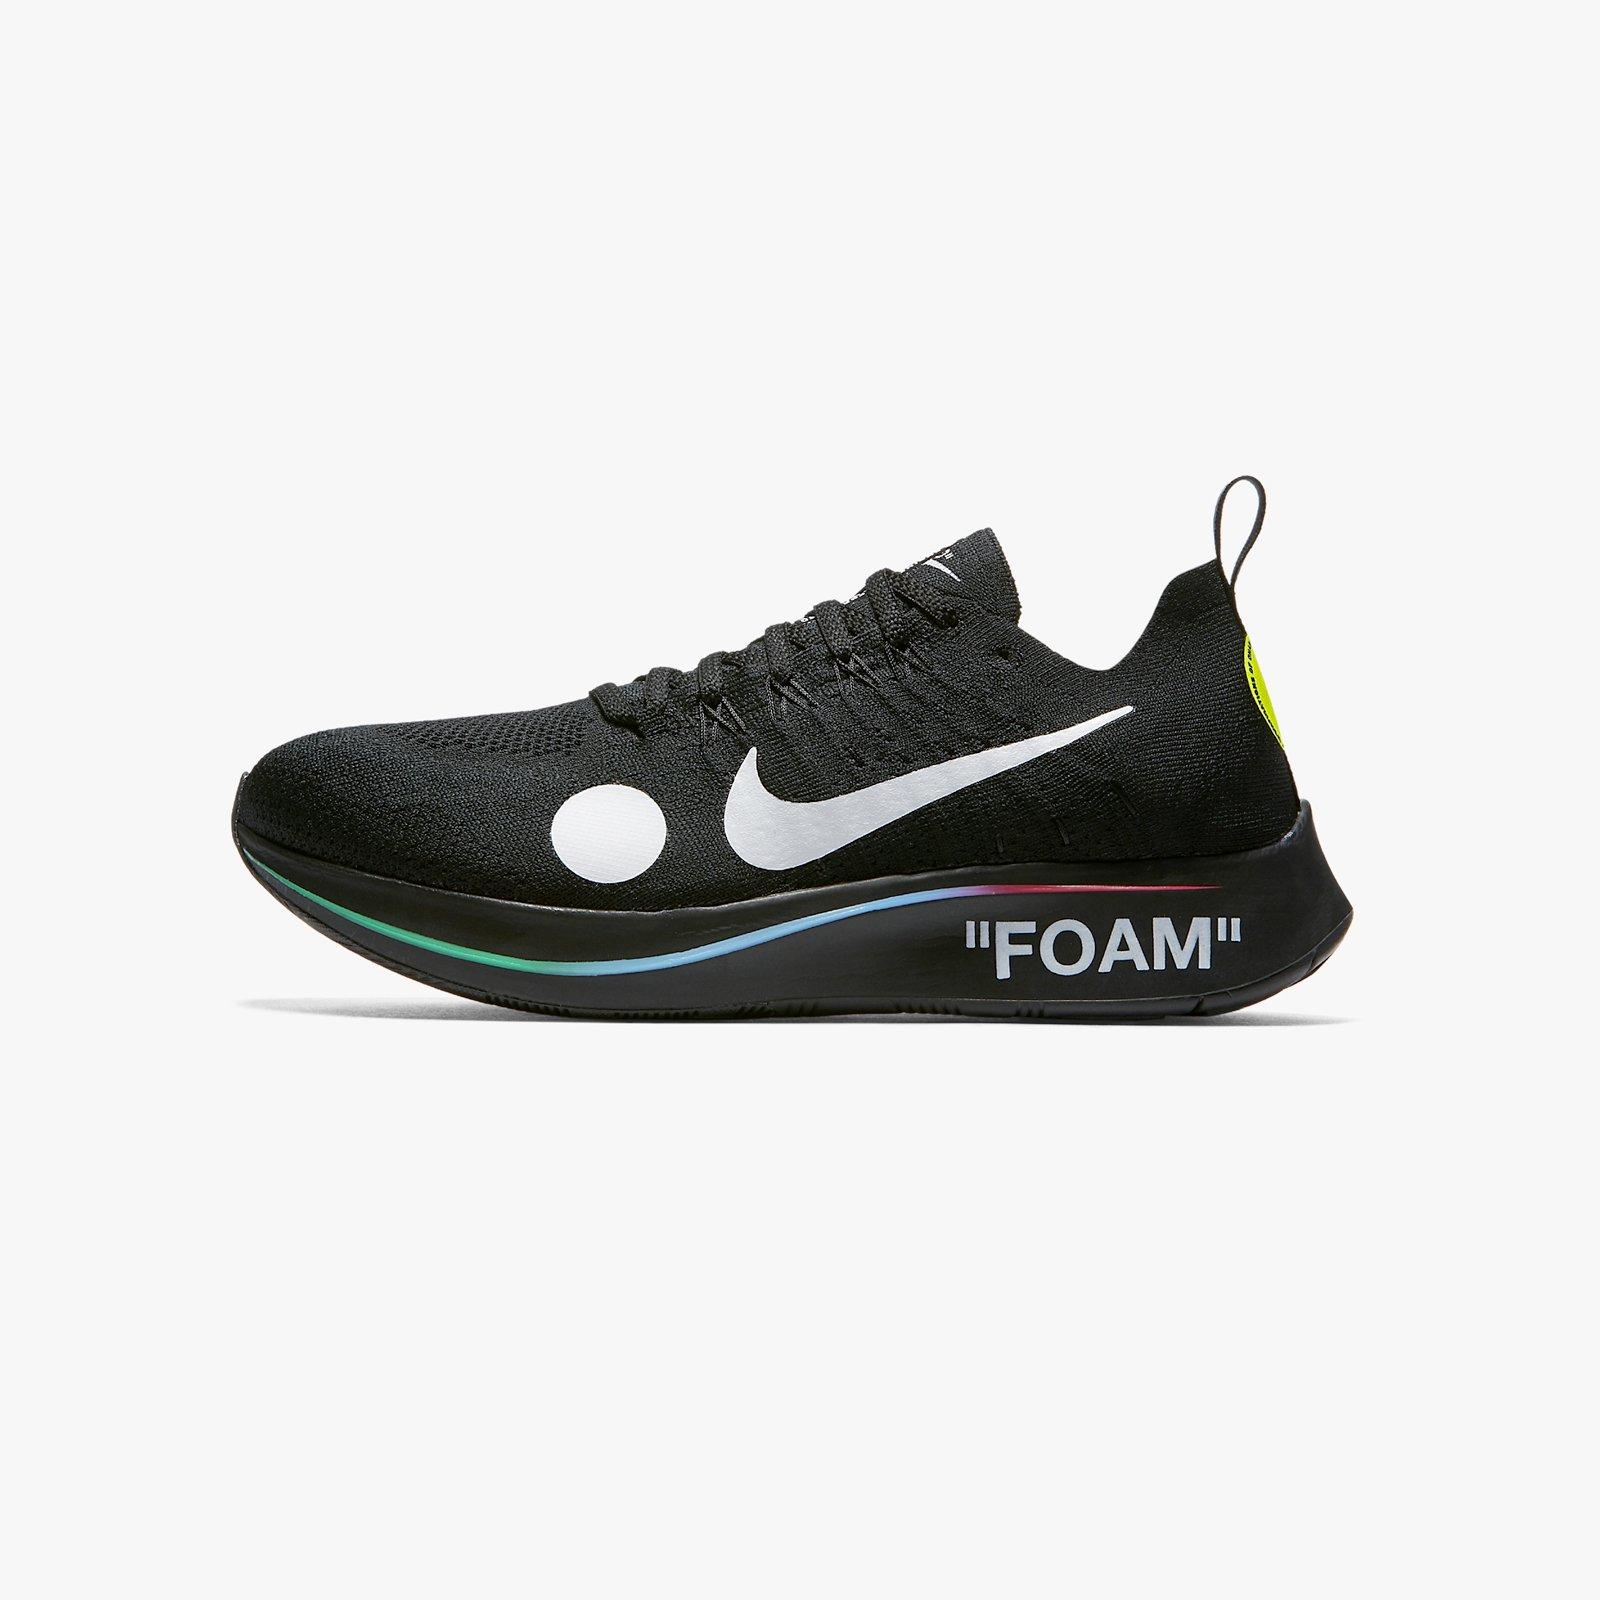 6ff8f54b2936 Nike Zoom Fly Mercurial Flyknit   Off-White - Ao2115-001 - Sneakersnstuff